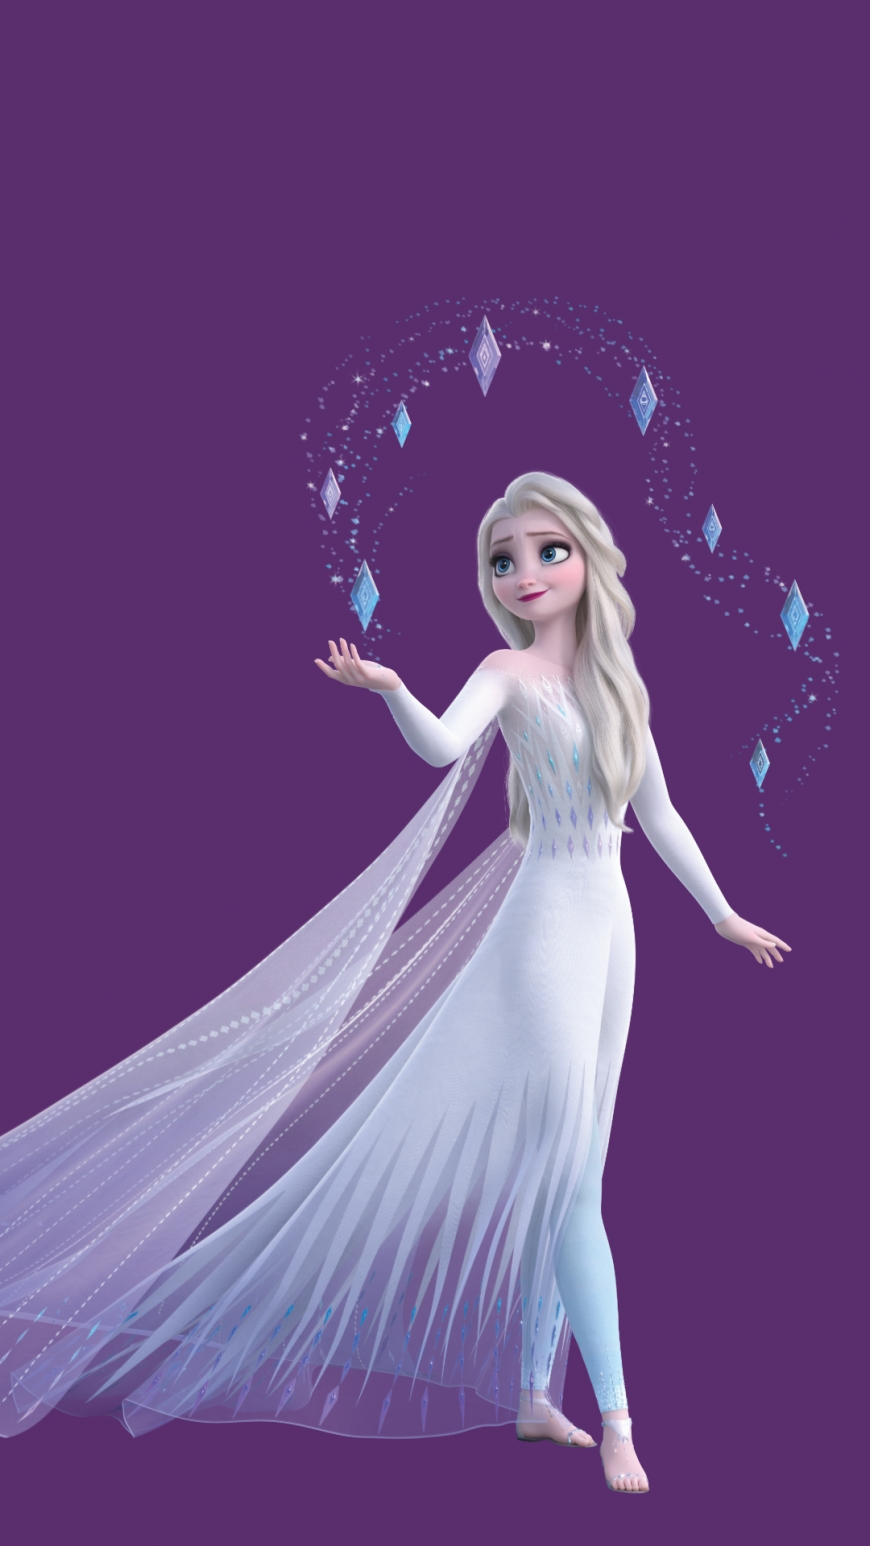 Fagyasztott 2 Hd Hatterkep Elsa Feher Ruha Hajat Lefele Mobil Trend In 2020 Disney Princess Drawings Frozen Pictures Disney Princess Pictures